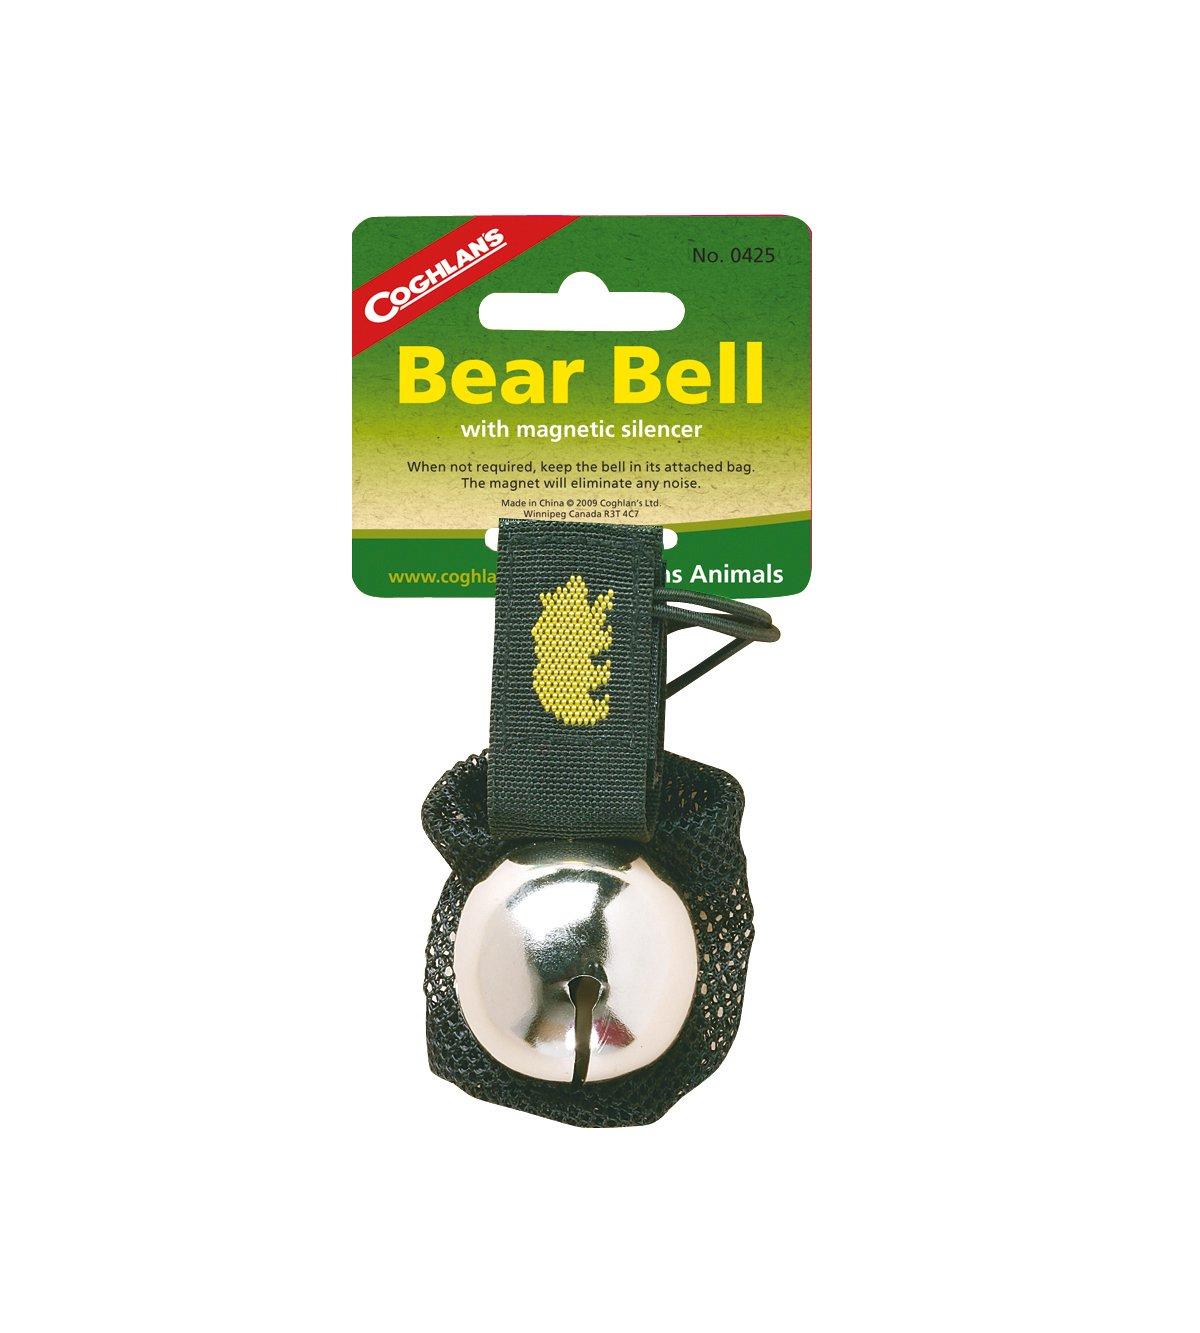 Coghlan's Bear Bell with Magnetic Silencer, Black Coghlans 0425